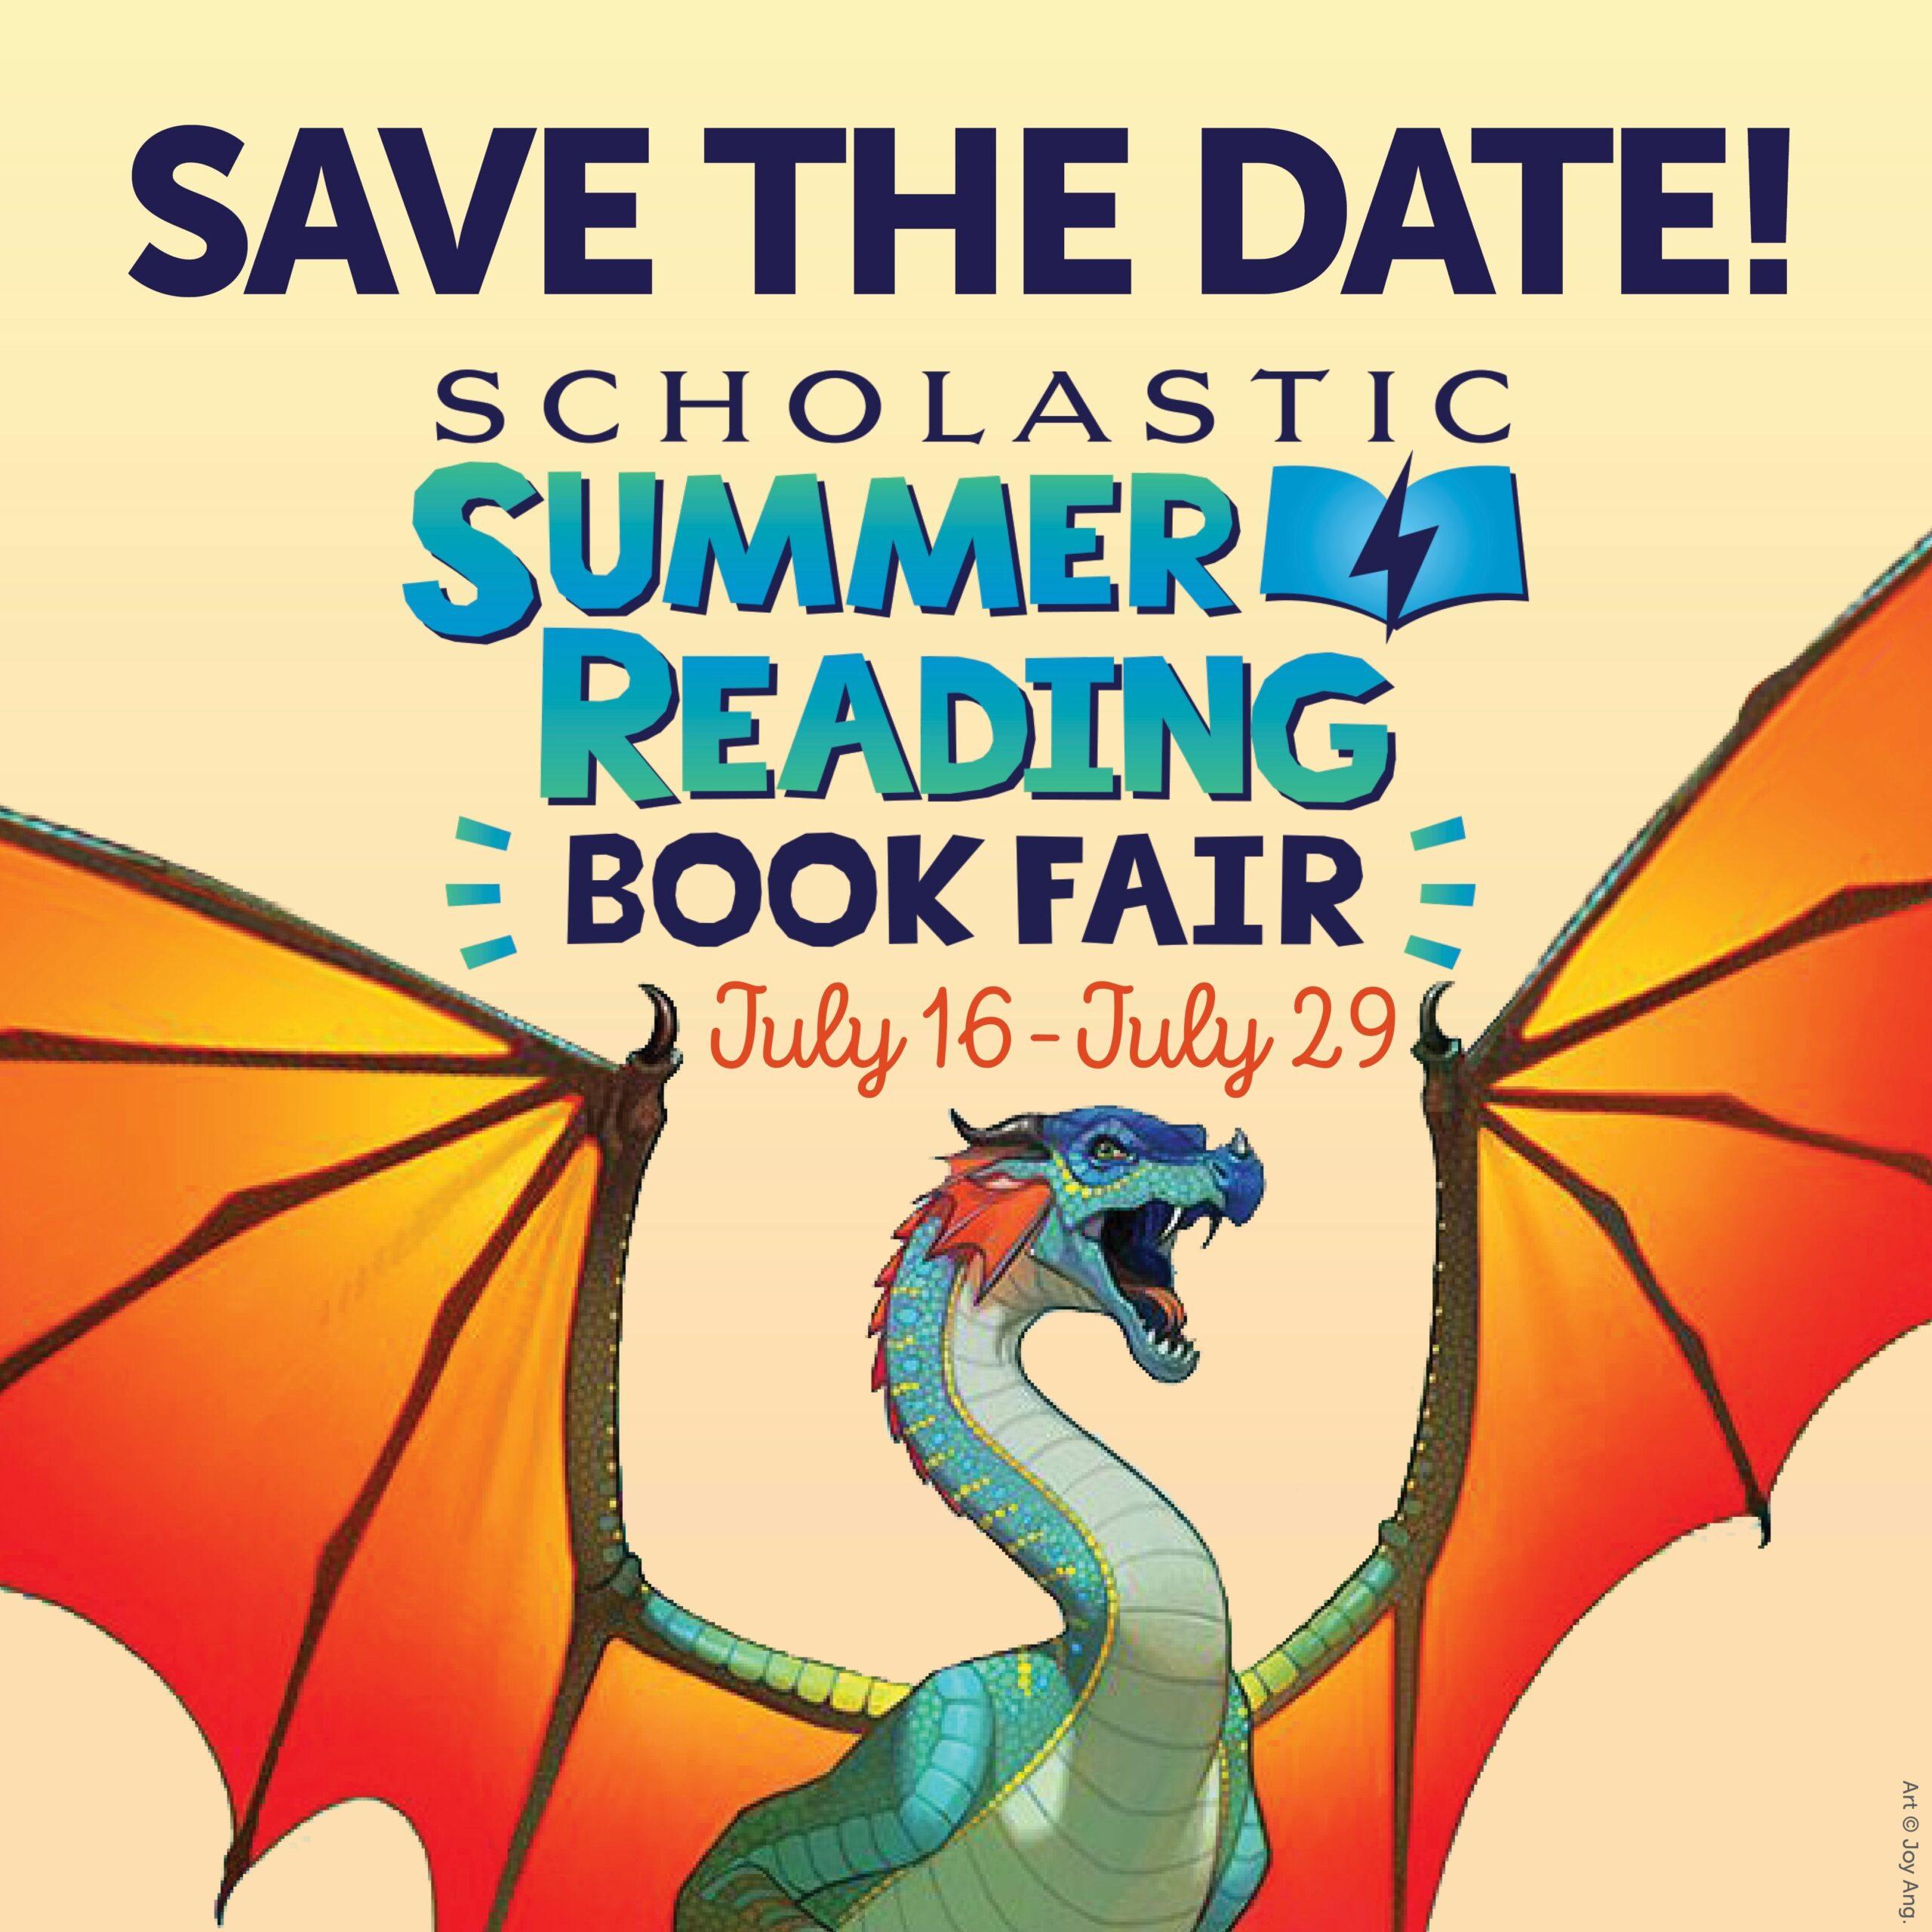 Virtual Scholastic Book Fair July 16-July 29!